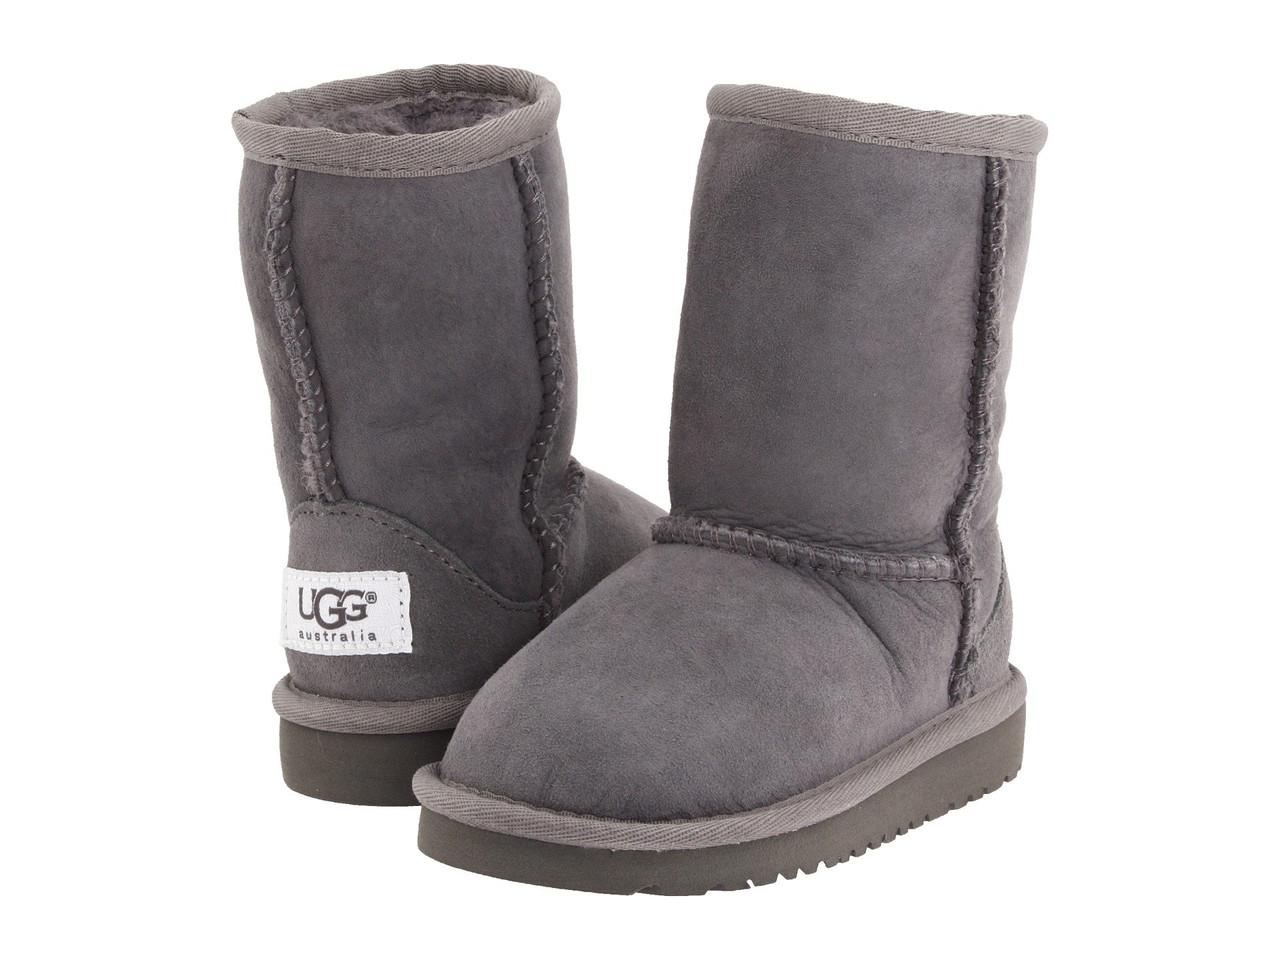 Дитячі UGG Classic short Grey (Уггі сірі дитячі). дитячі уггі, уггі дитячі